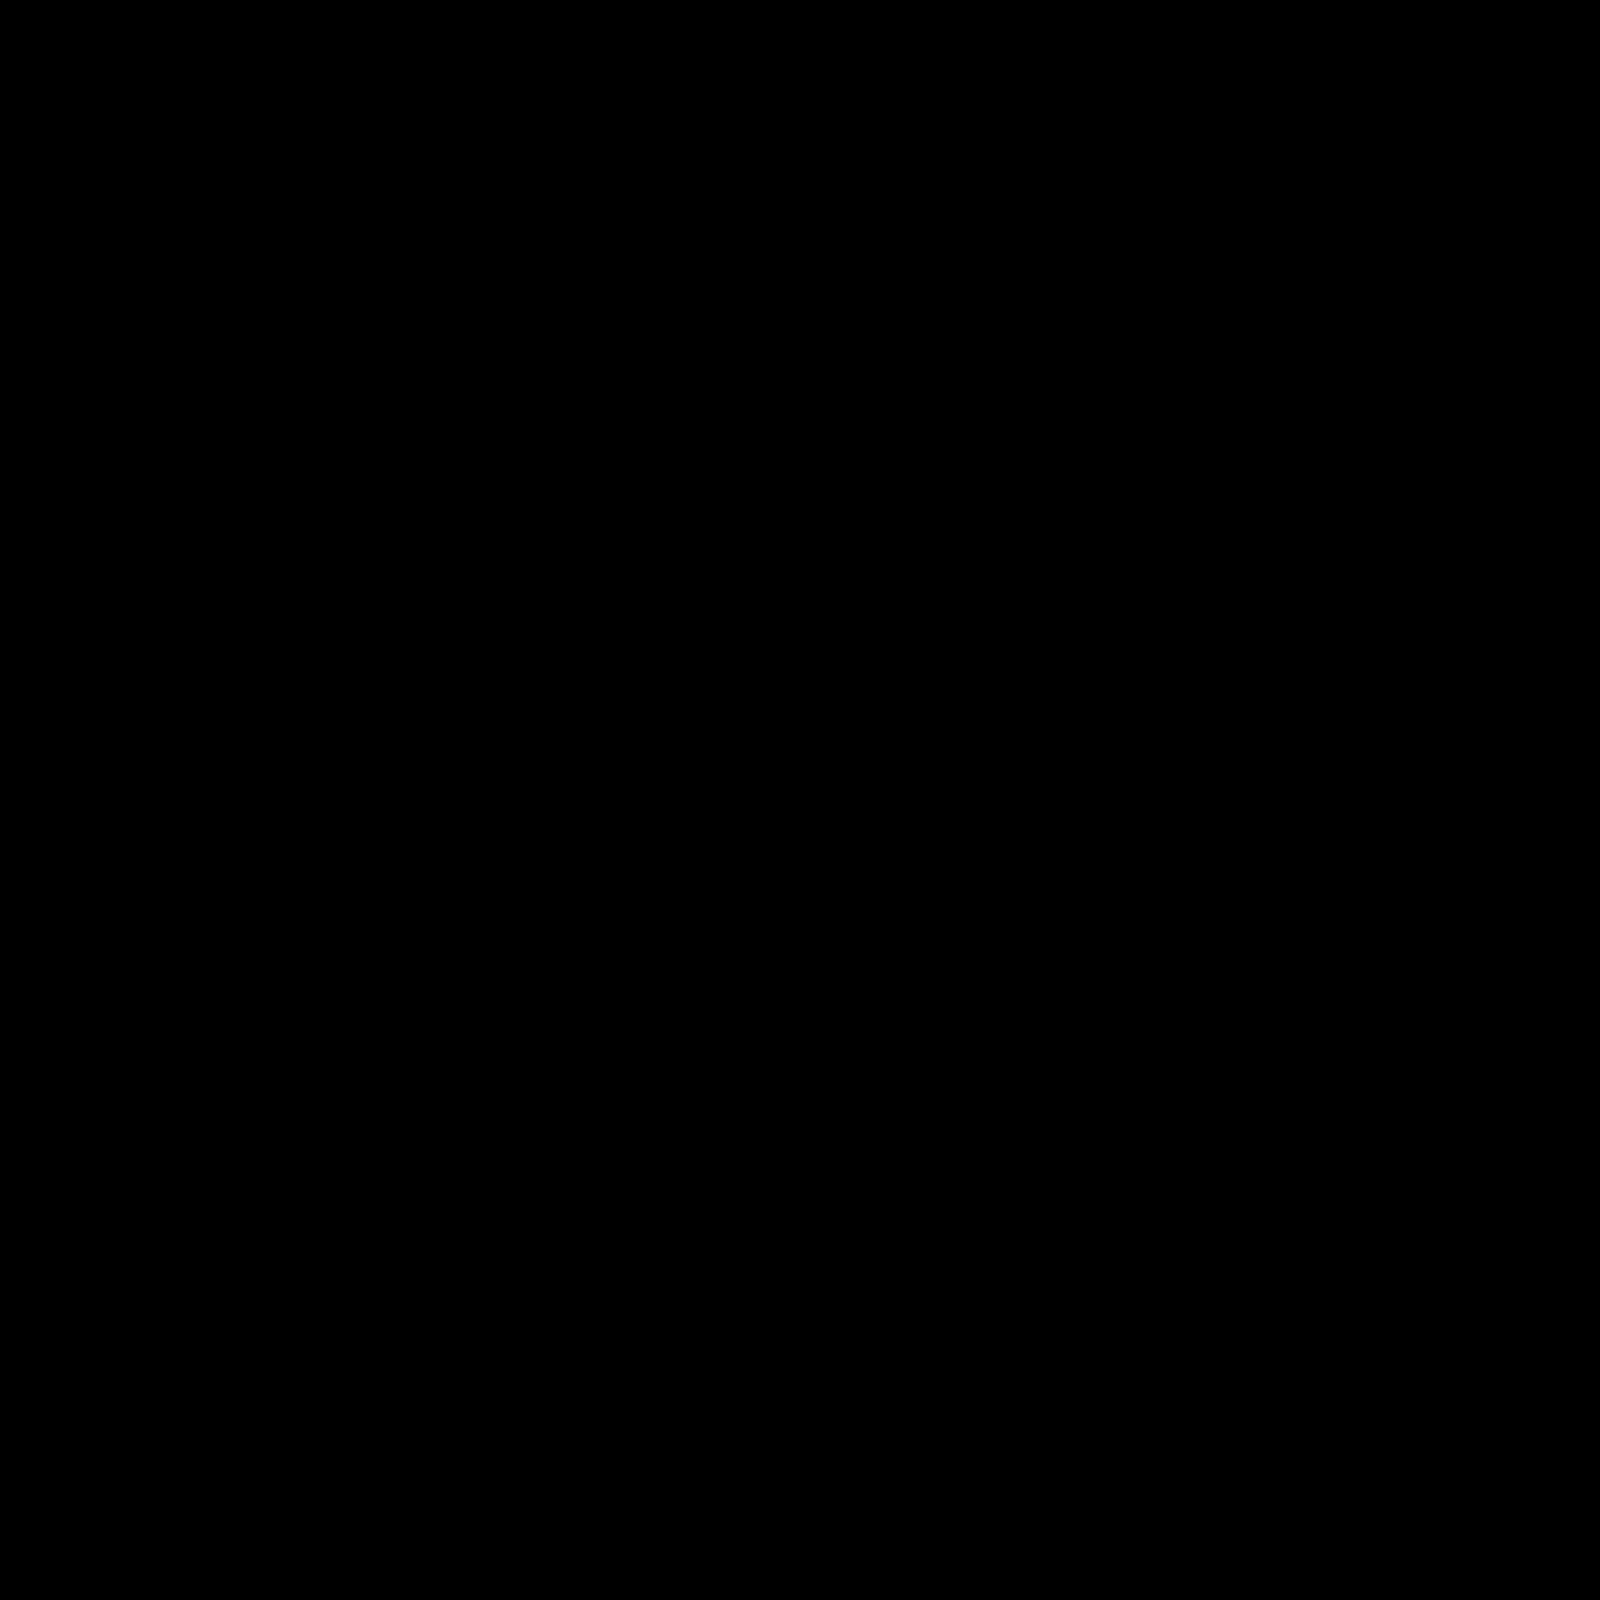 Basketball clipart eps banner transparent Basketball ícones - Download Gratuito em PNG e SVG banner transparent